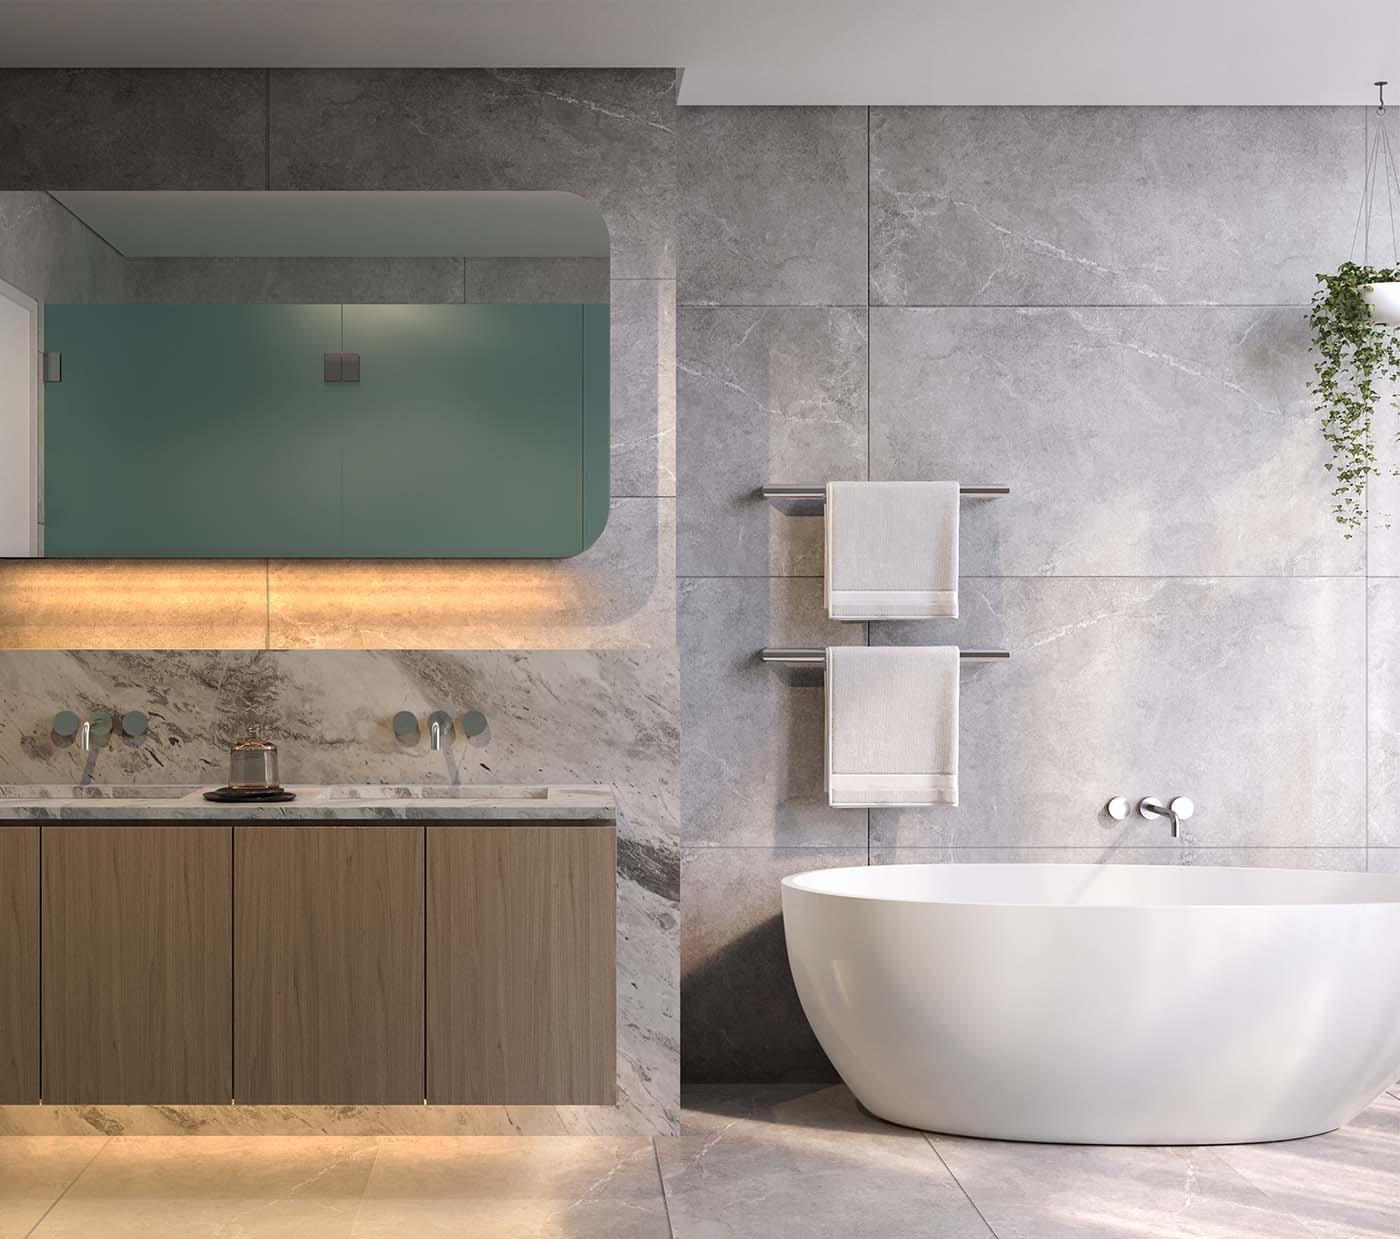 Bathroom in Cronulla Beach showing different stones, sink and bathtub